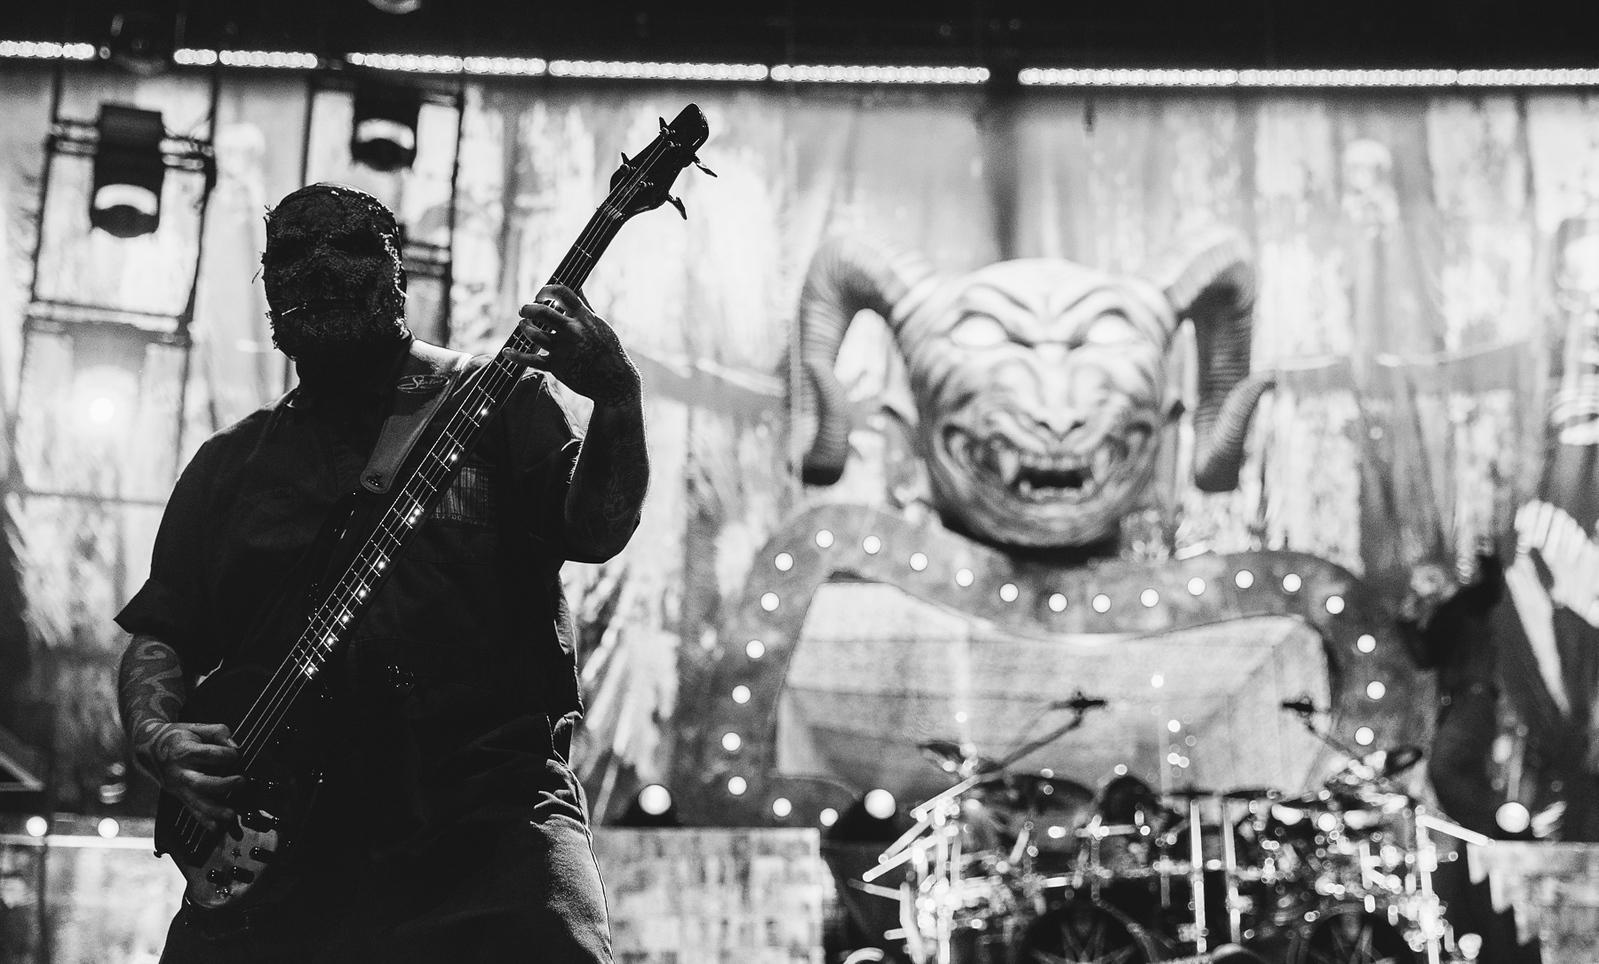 Alessandro Venturella of Slipknot by Adam Elmakias at Knotfest 2015